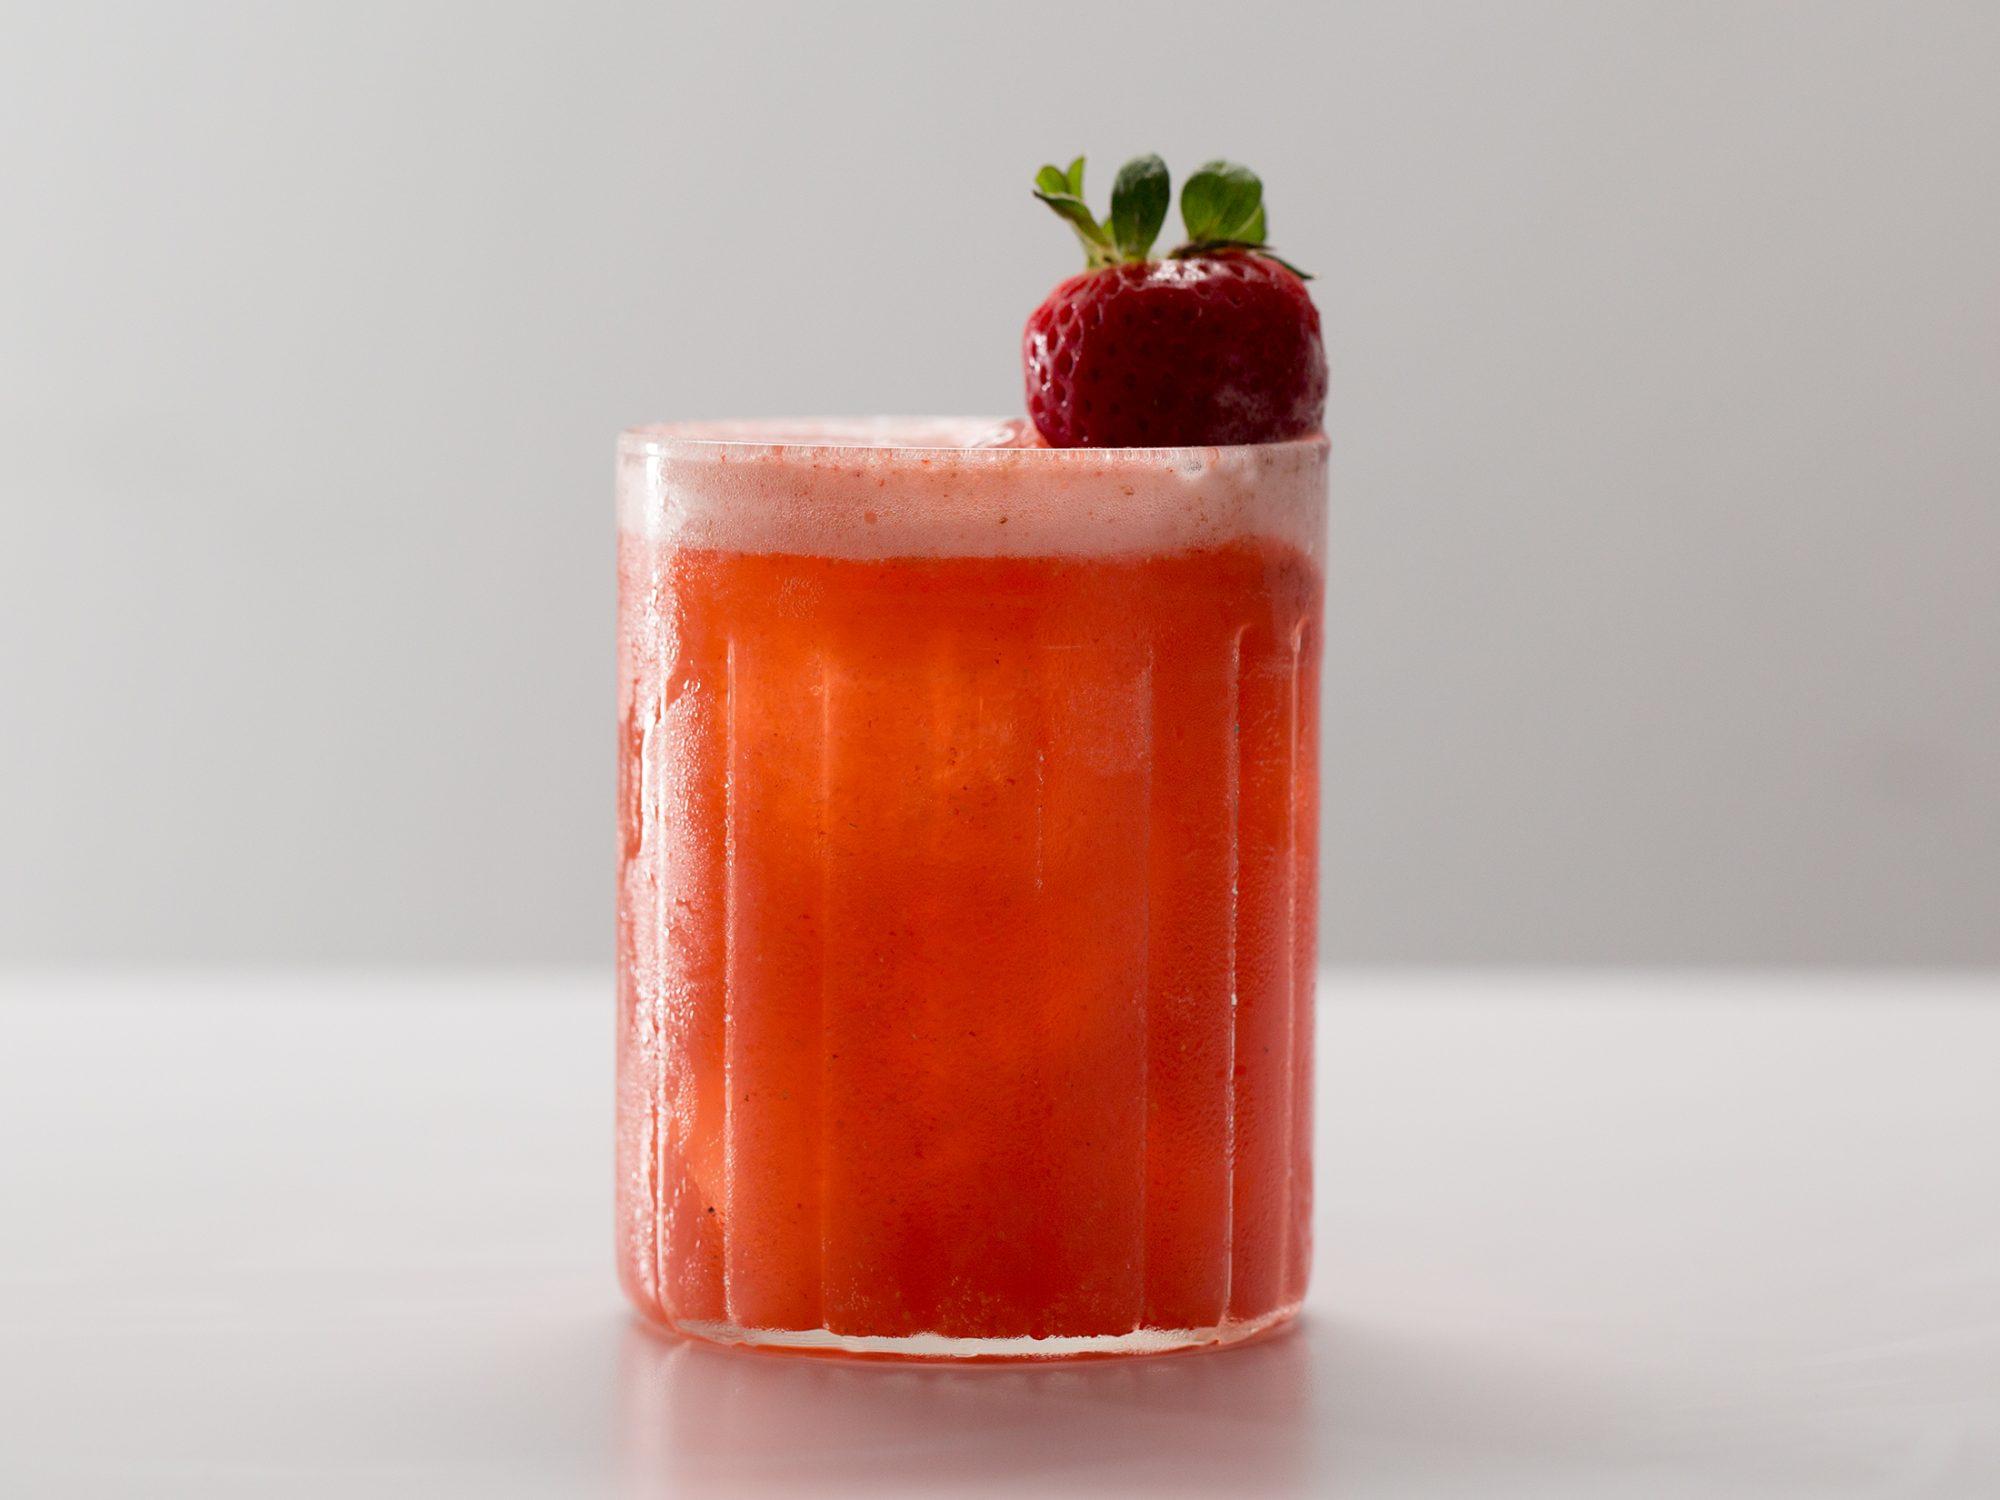 Straw-beer-ita image